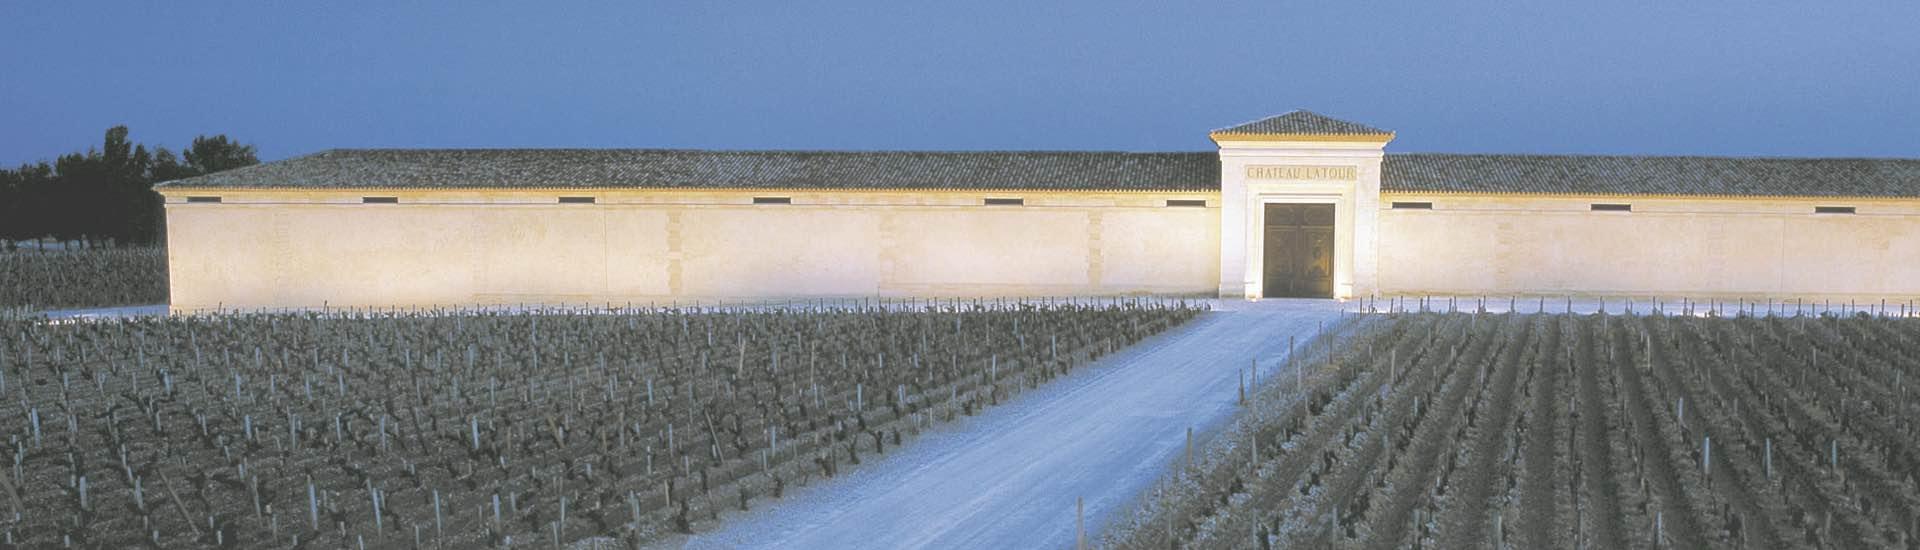 Weine - Rarität des Monats: Château Latour 2005 10/2017 - Slider